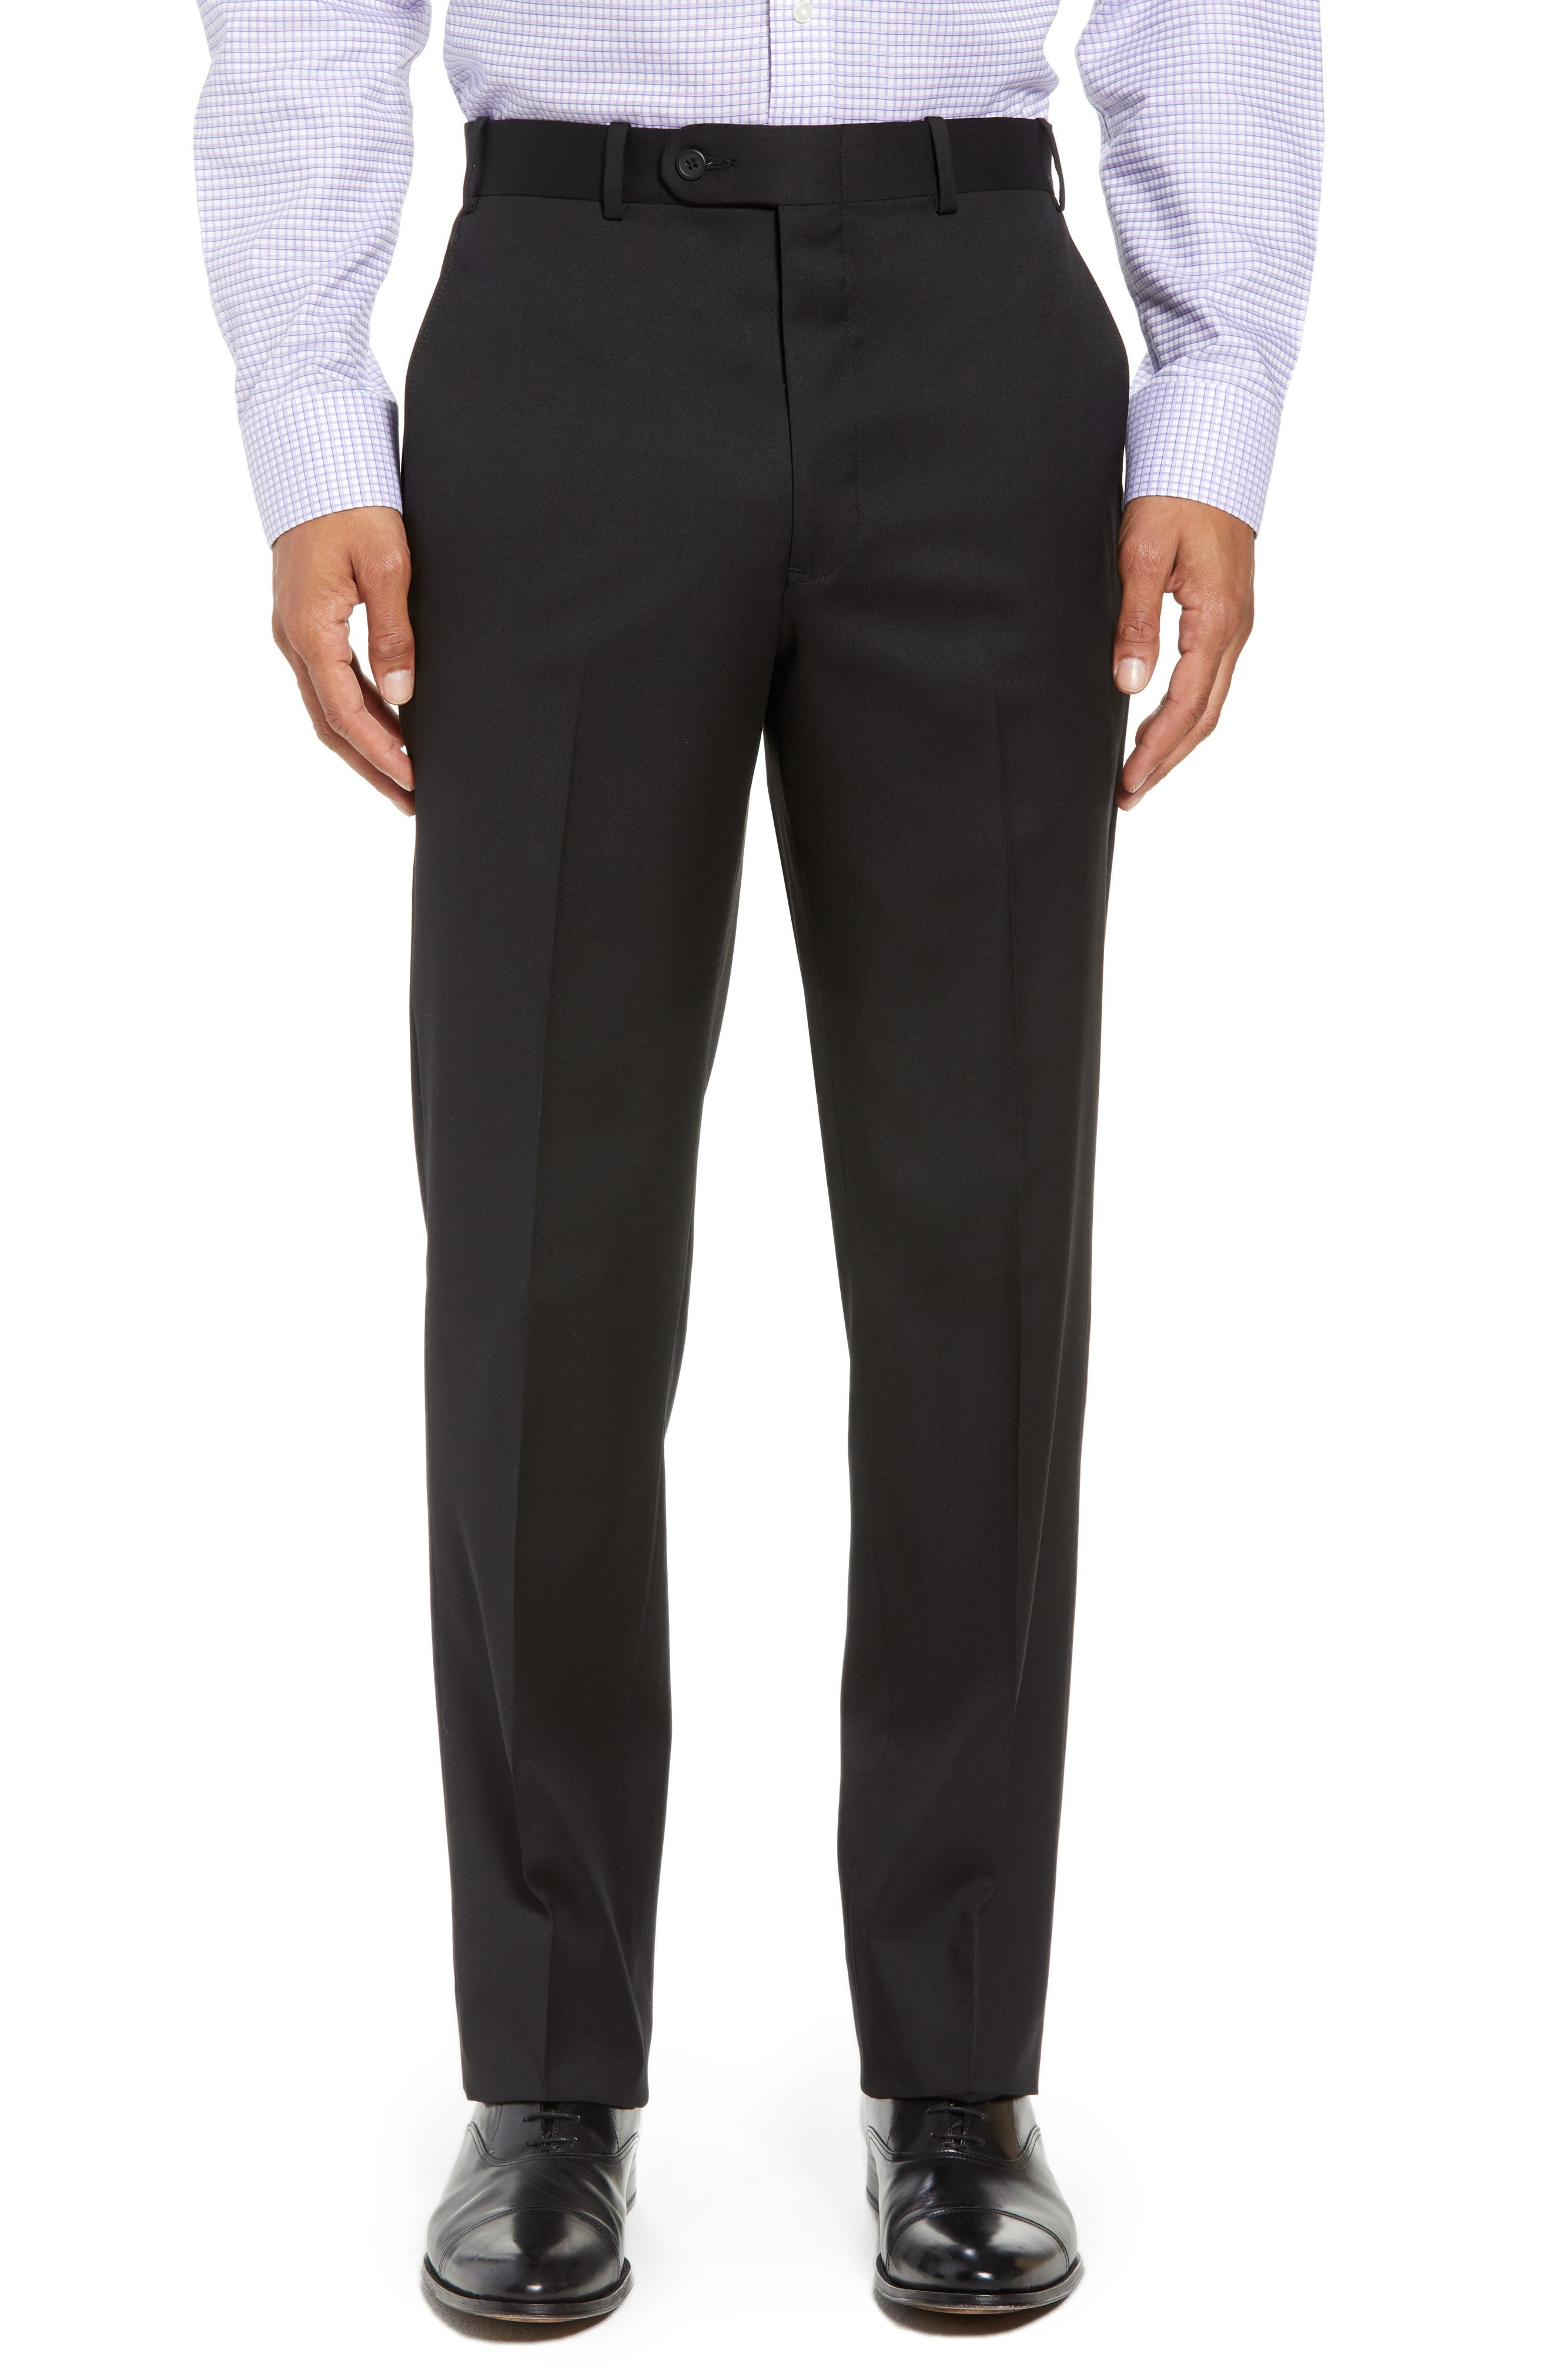 Torino Flat Front Wool Gabardine Trousers,                             Main thumbnail 1, color,                             001